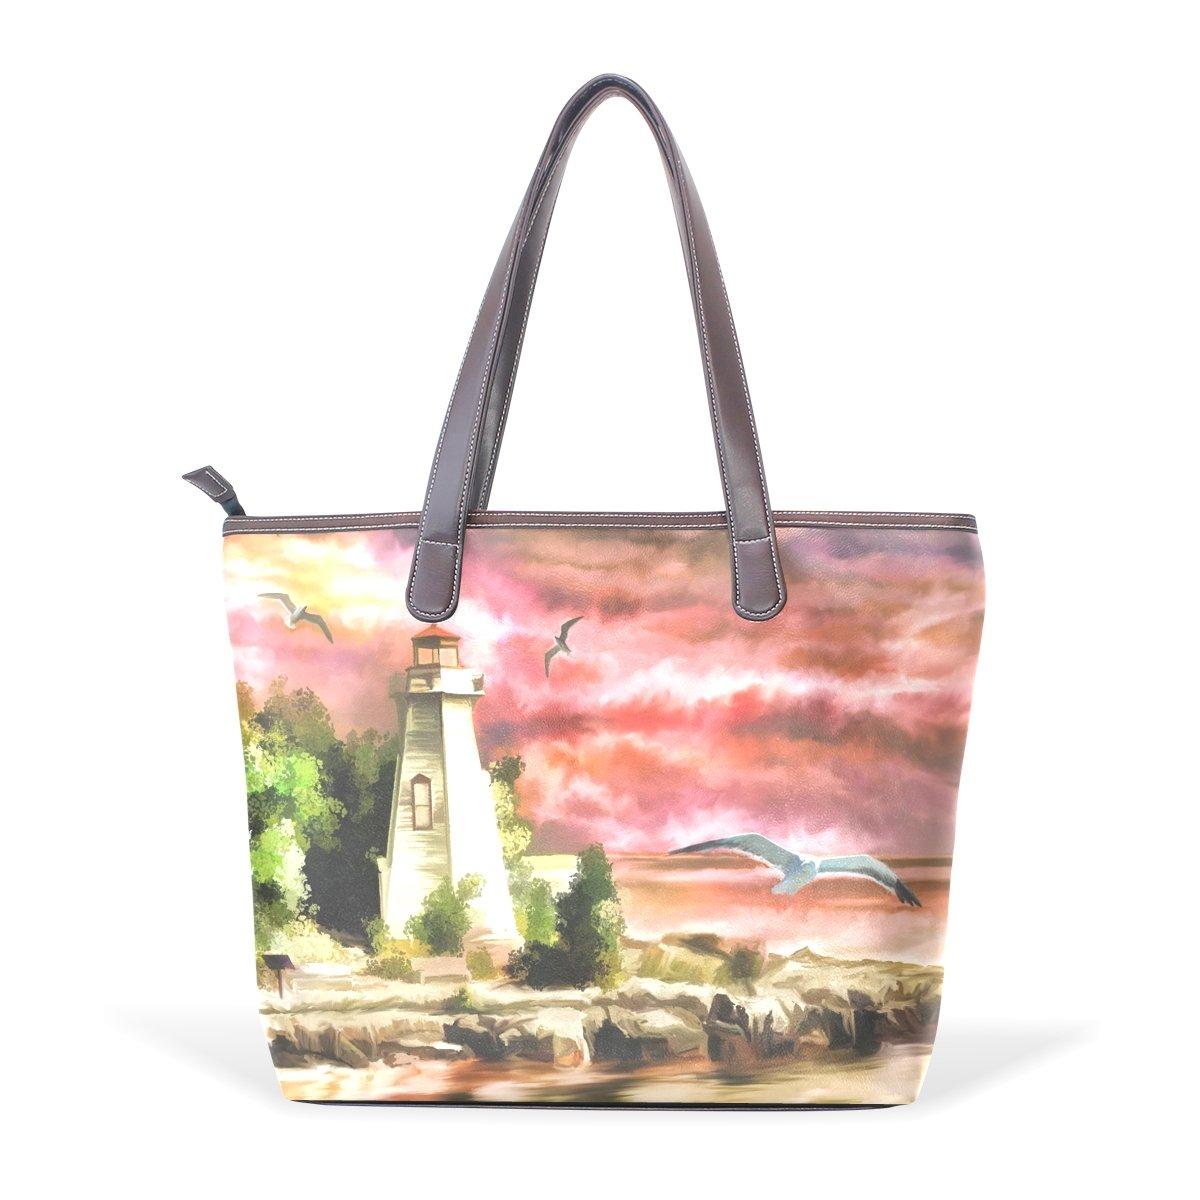 COOSUN Damen Light House House House Pu Leder Tote Handtasche Schultertasche M B0725464RG Shopper Zu einem erschwinglichen Preis 209f38